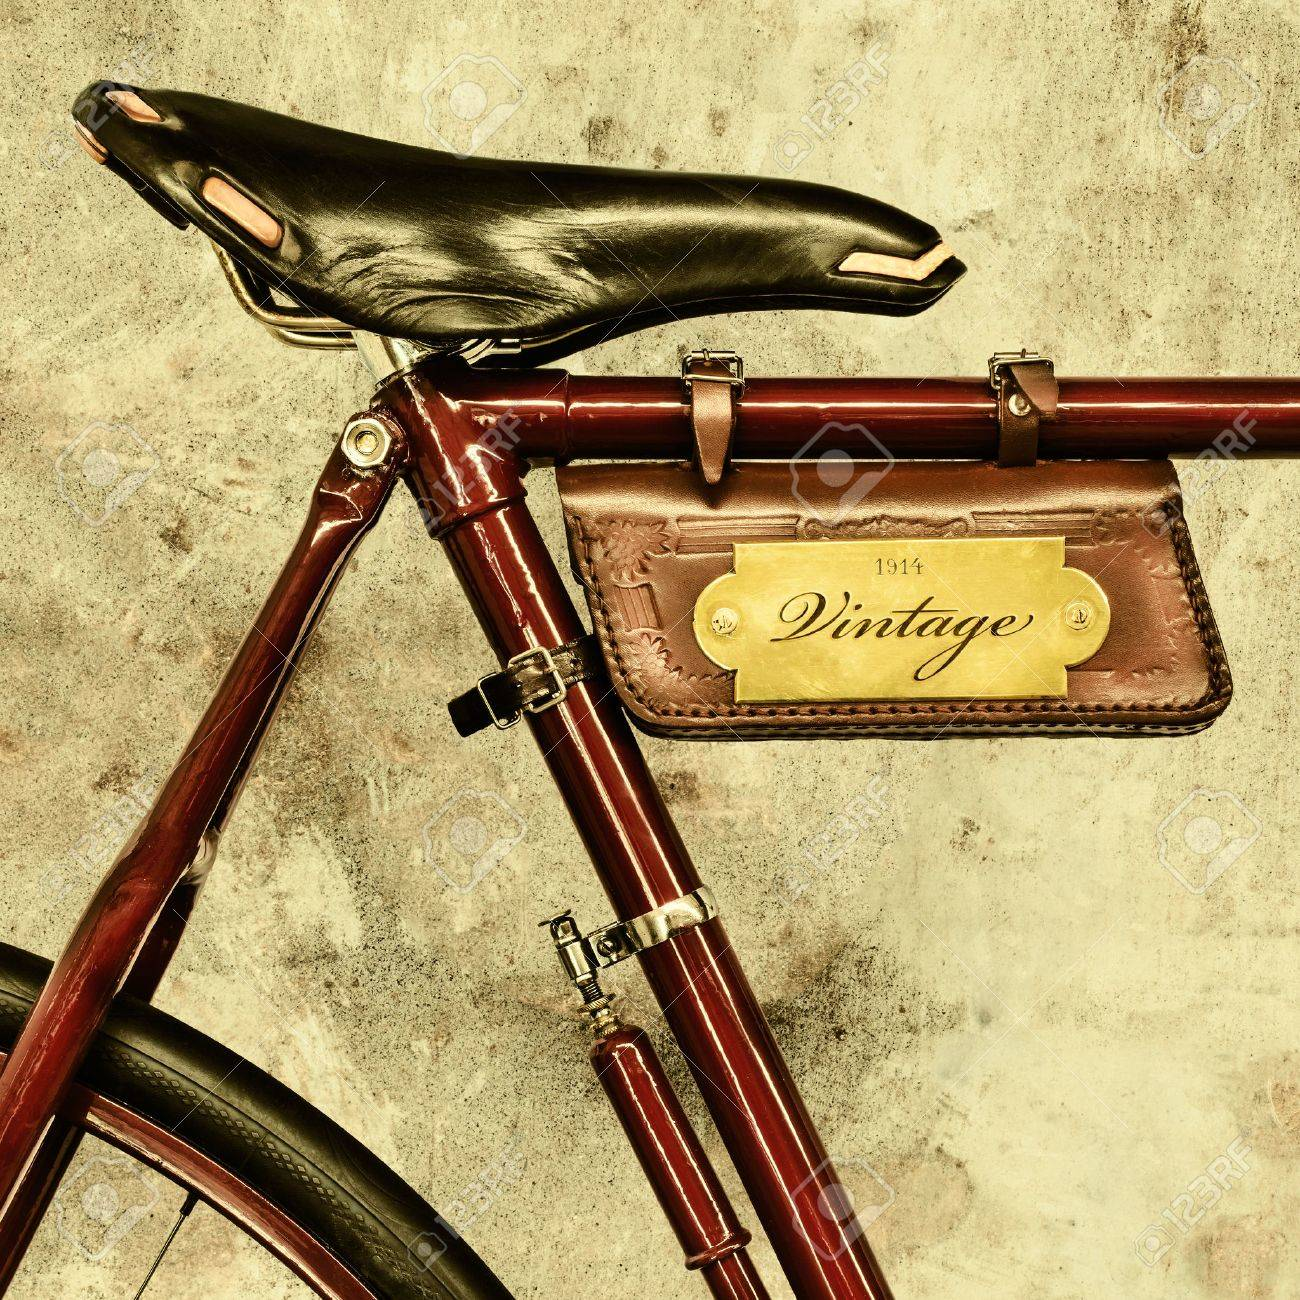 Vintage Leather Saddle Bag For Bicycle